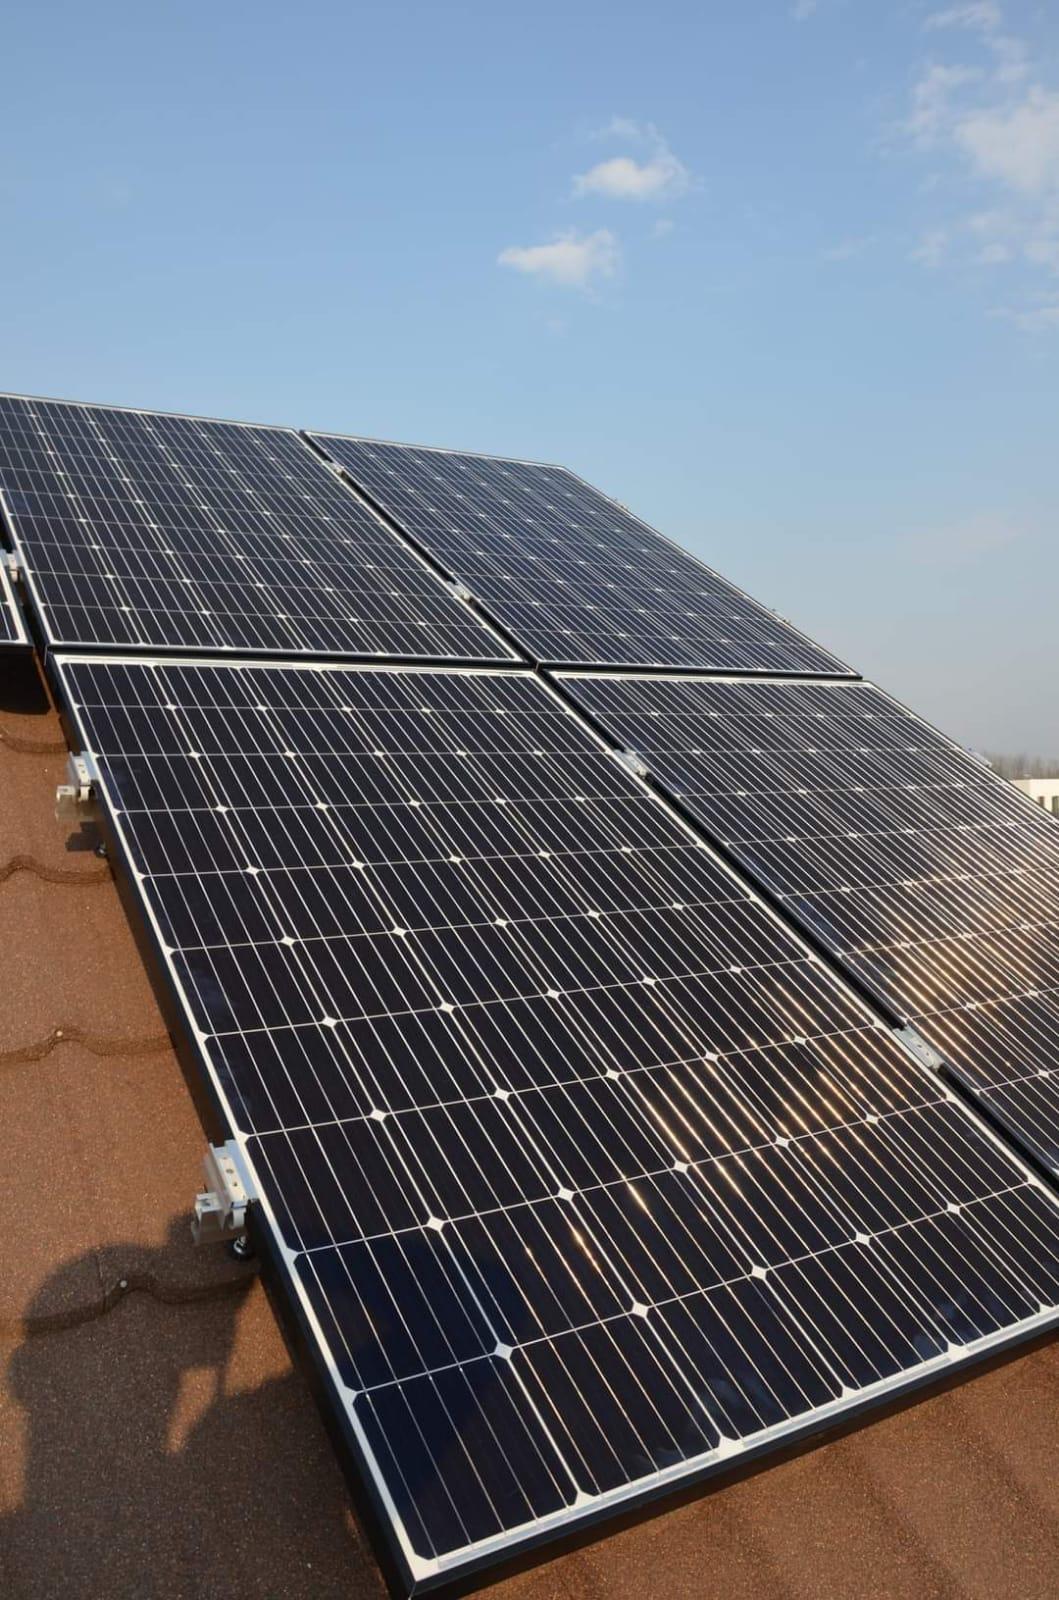 https://www.grupaxa.ro/wp-content/uploads/2021/07/invertor-panouri-fotovoltaice-arges.jpeg